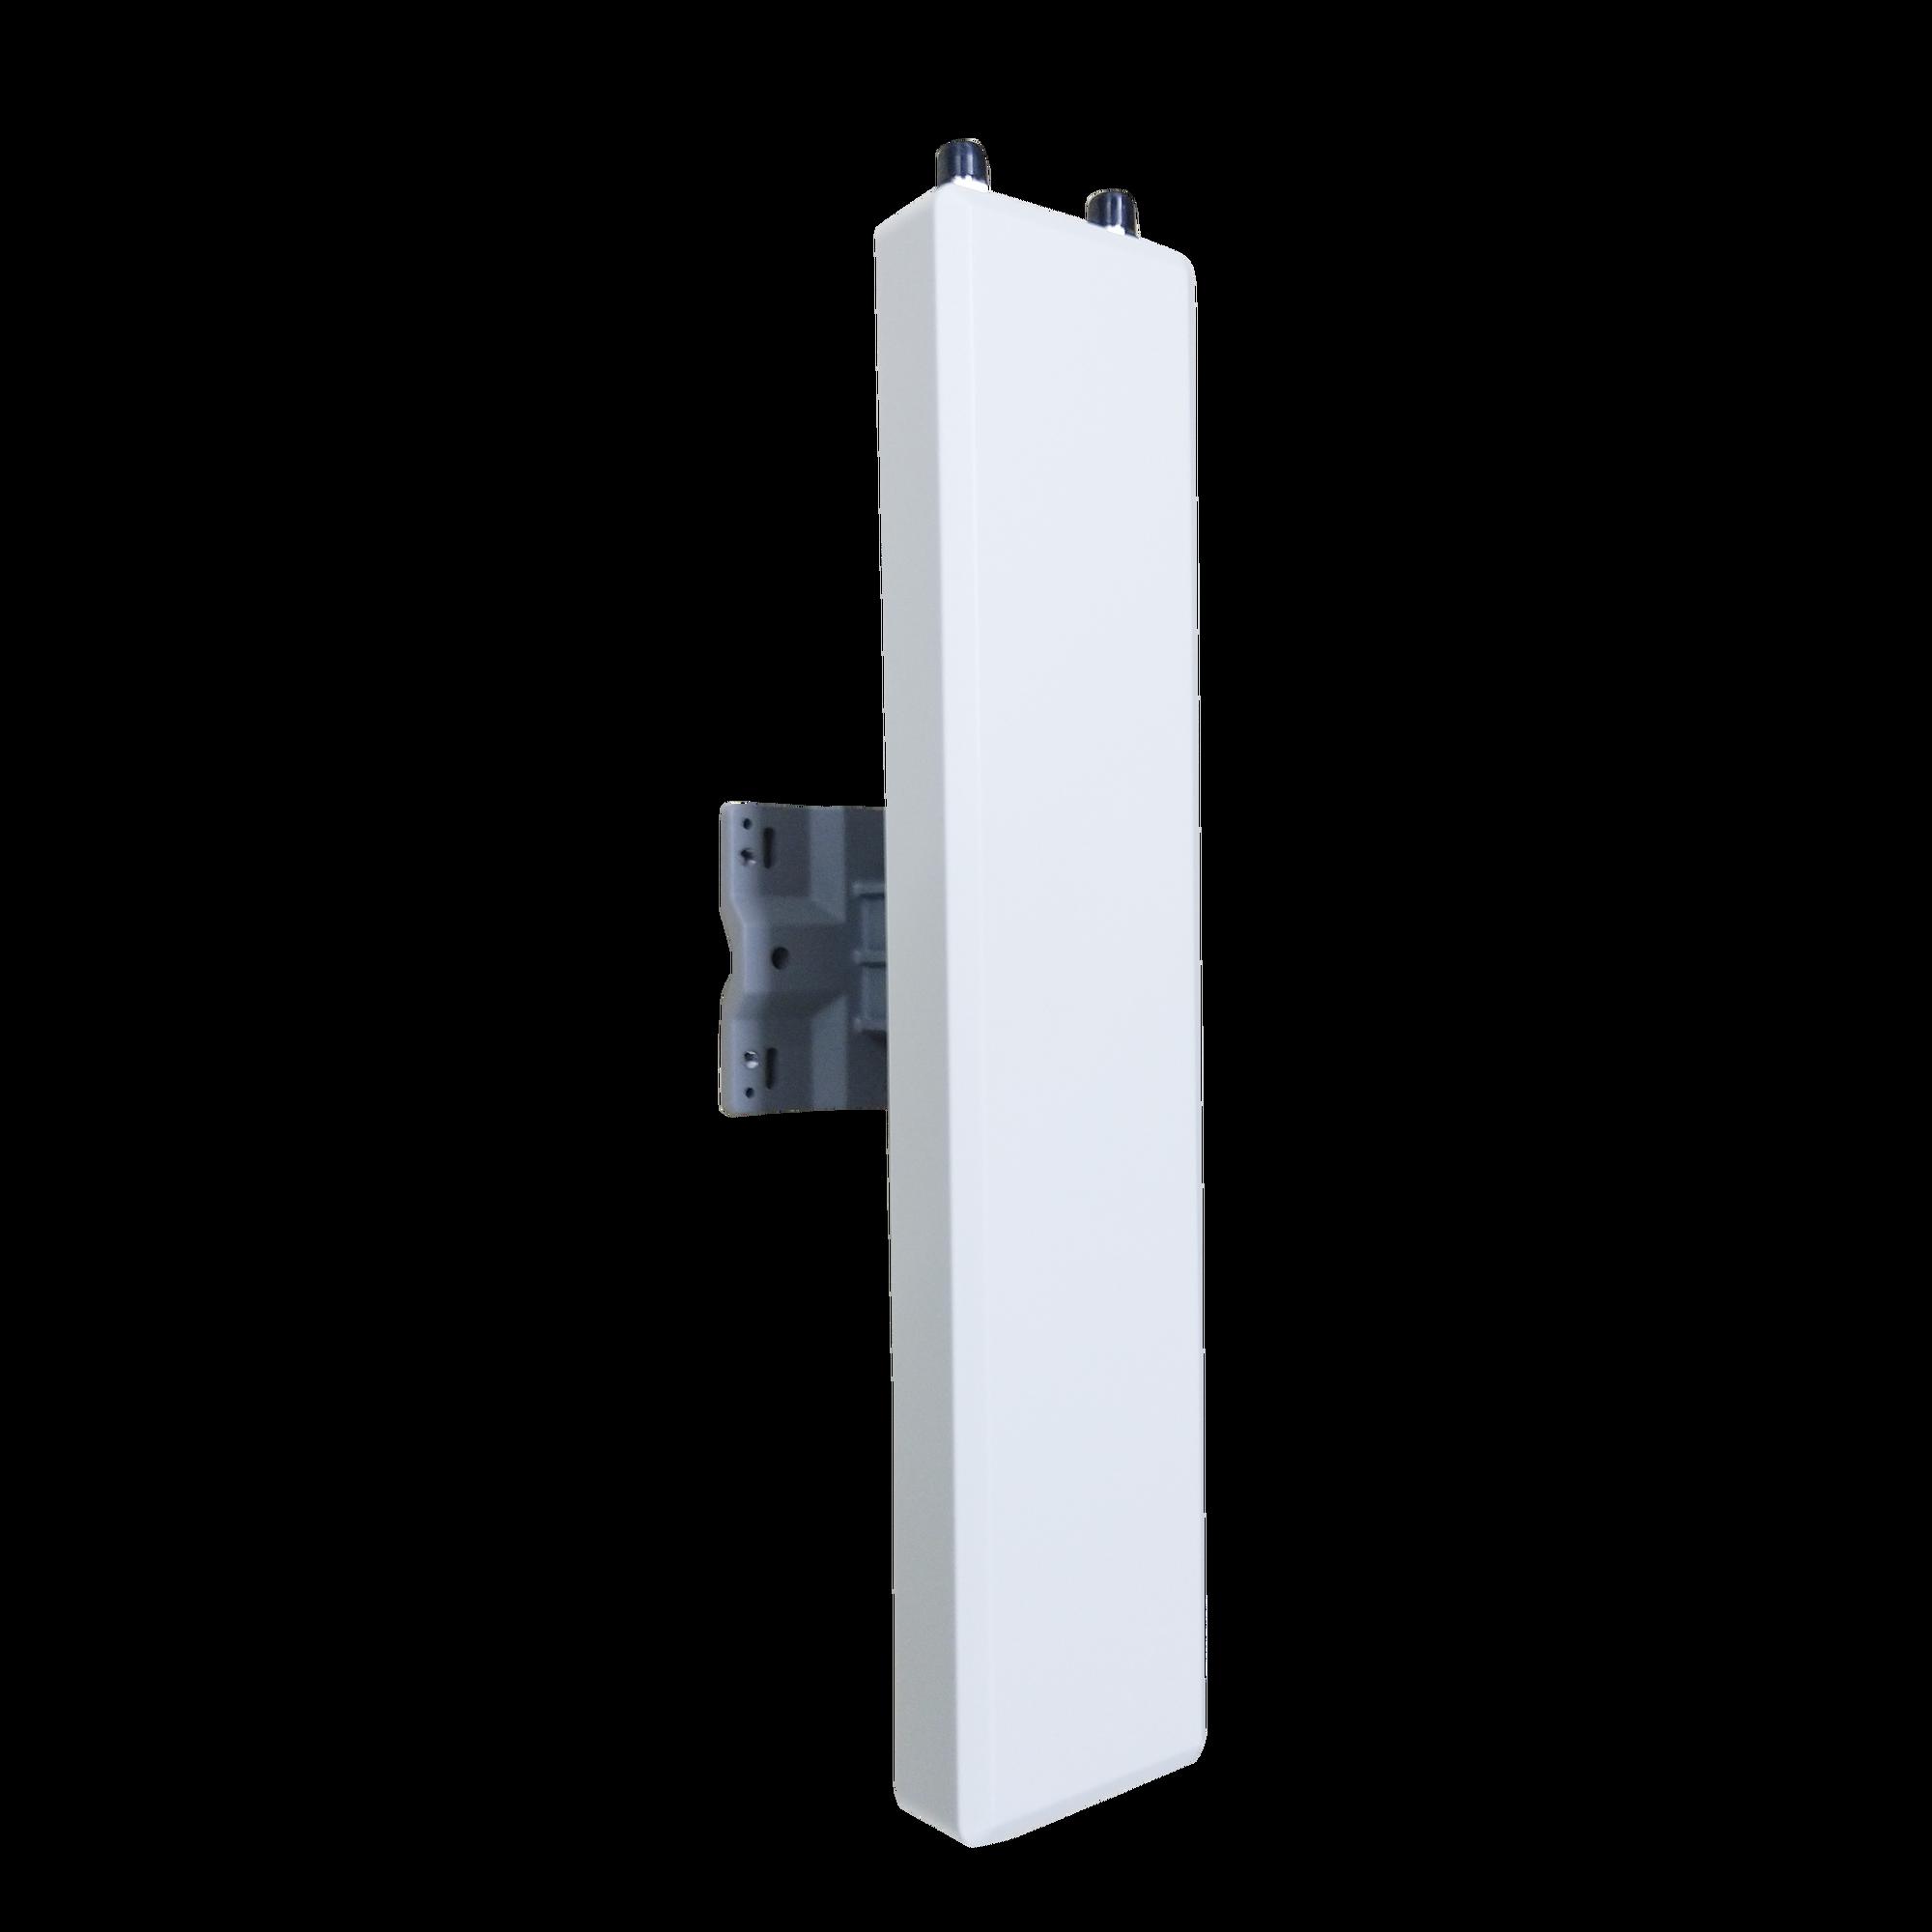 Antena Sectorial, 2.4 GHz, 14 dBi, 2 N-Hembra, 70?, Polaridad Cruzada